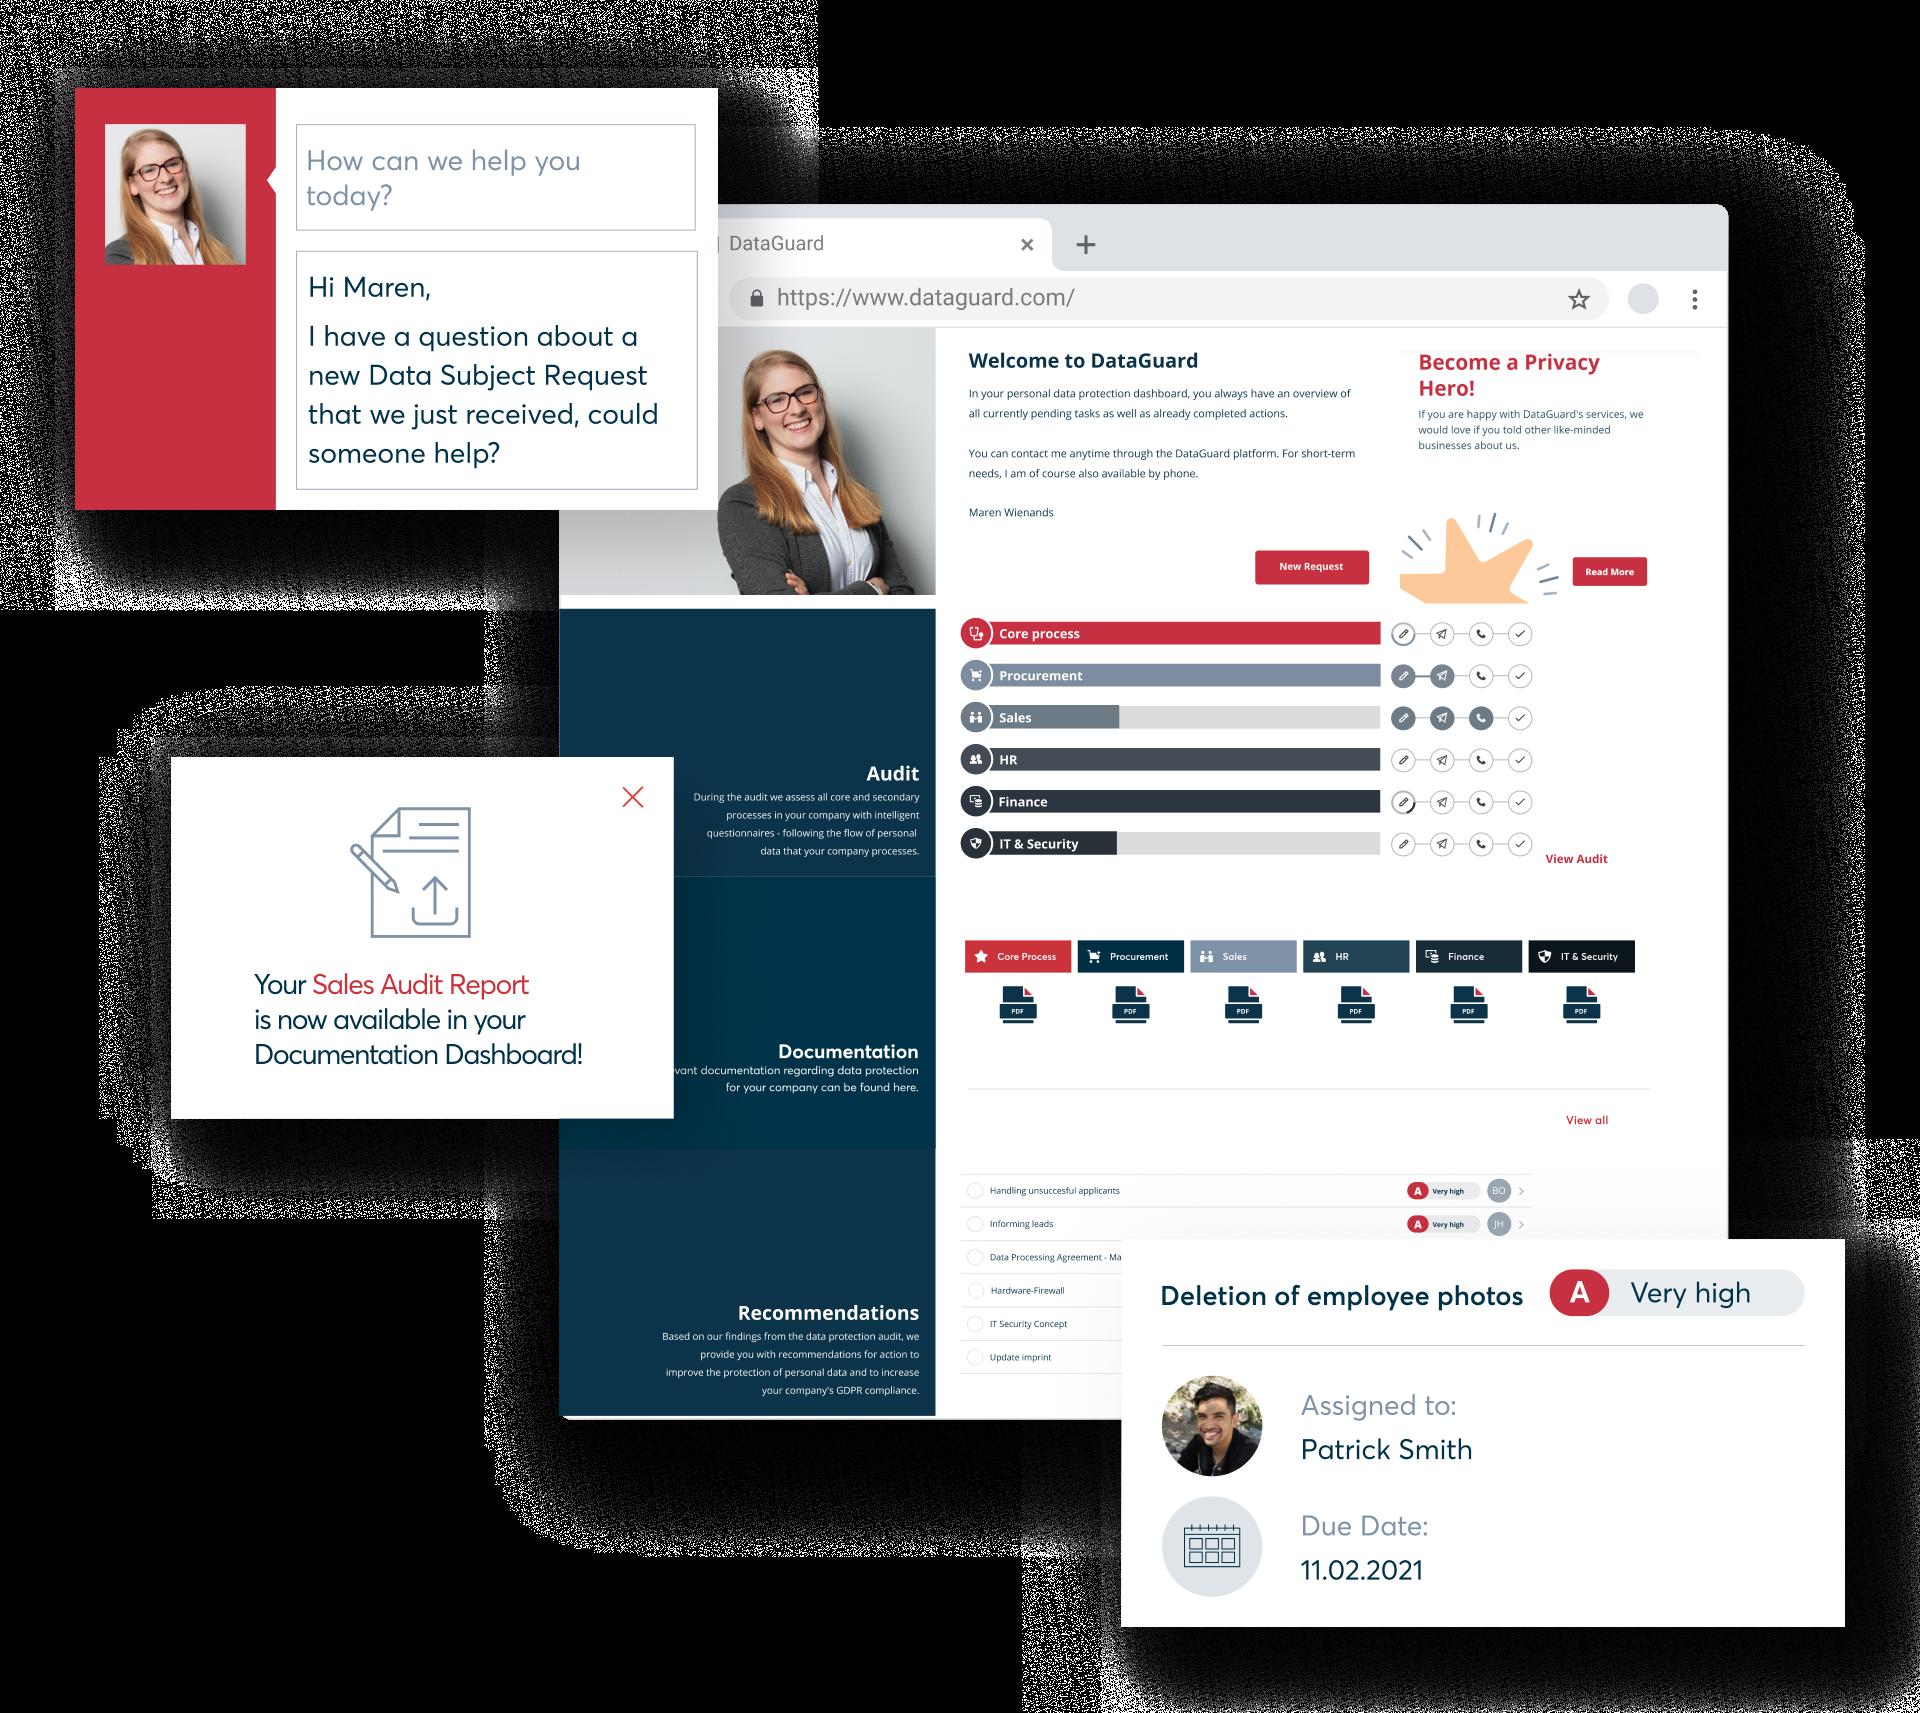 DataGuard's proprietary privacy platform